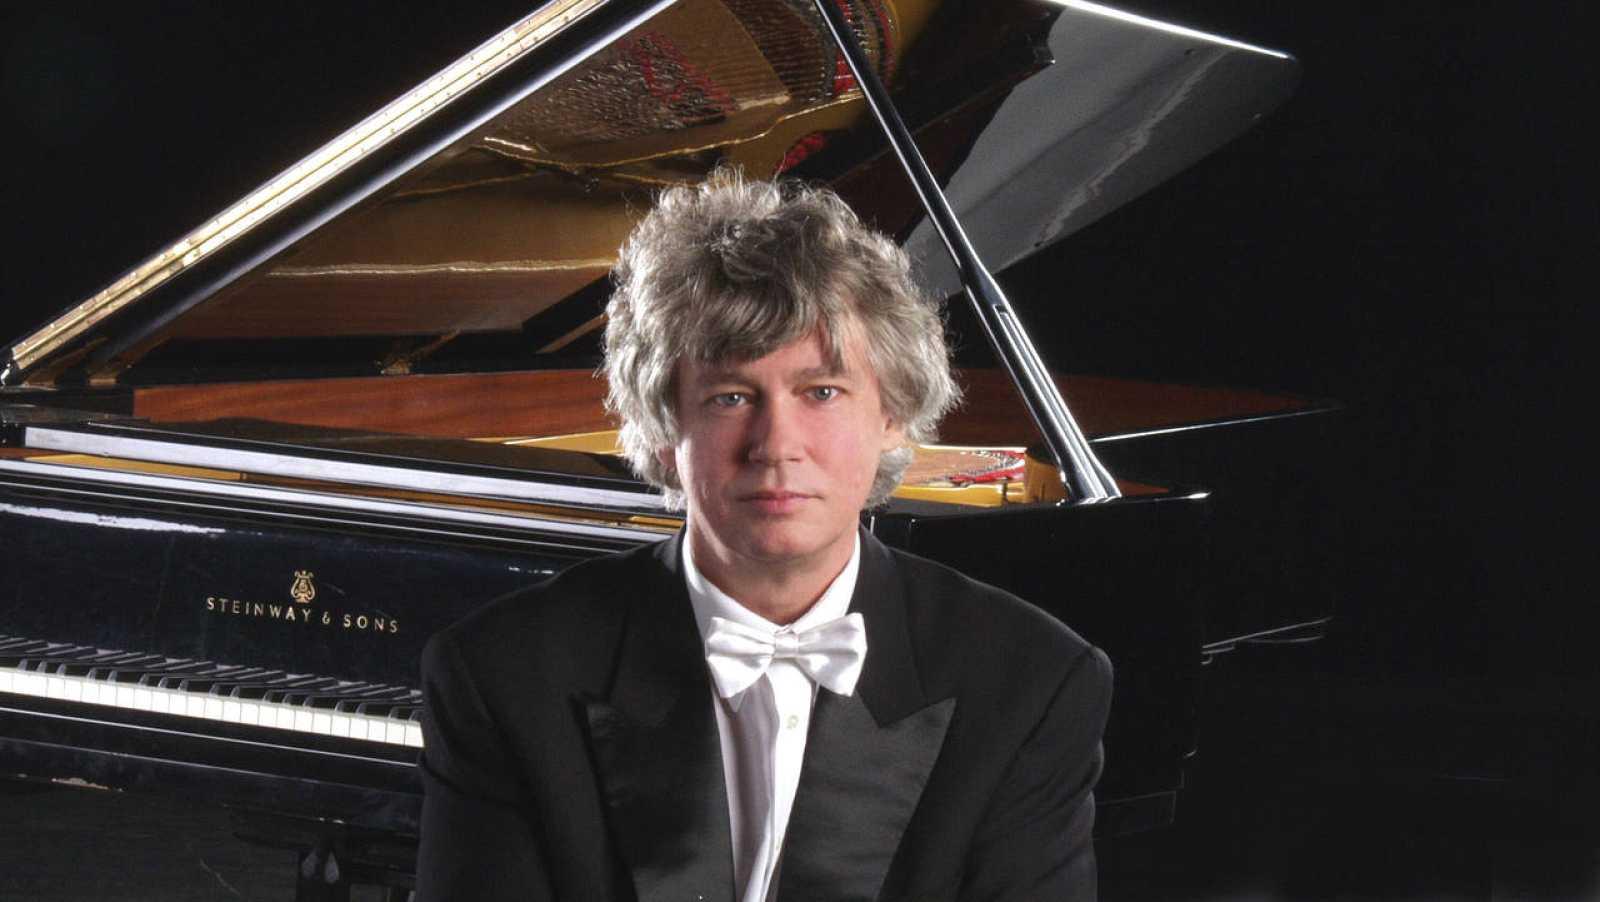 El pianista Zoltan Kocsis